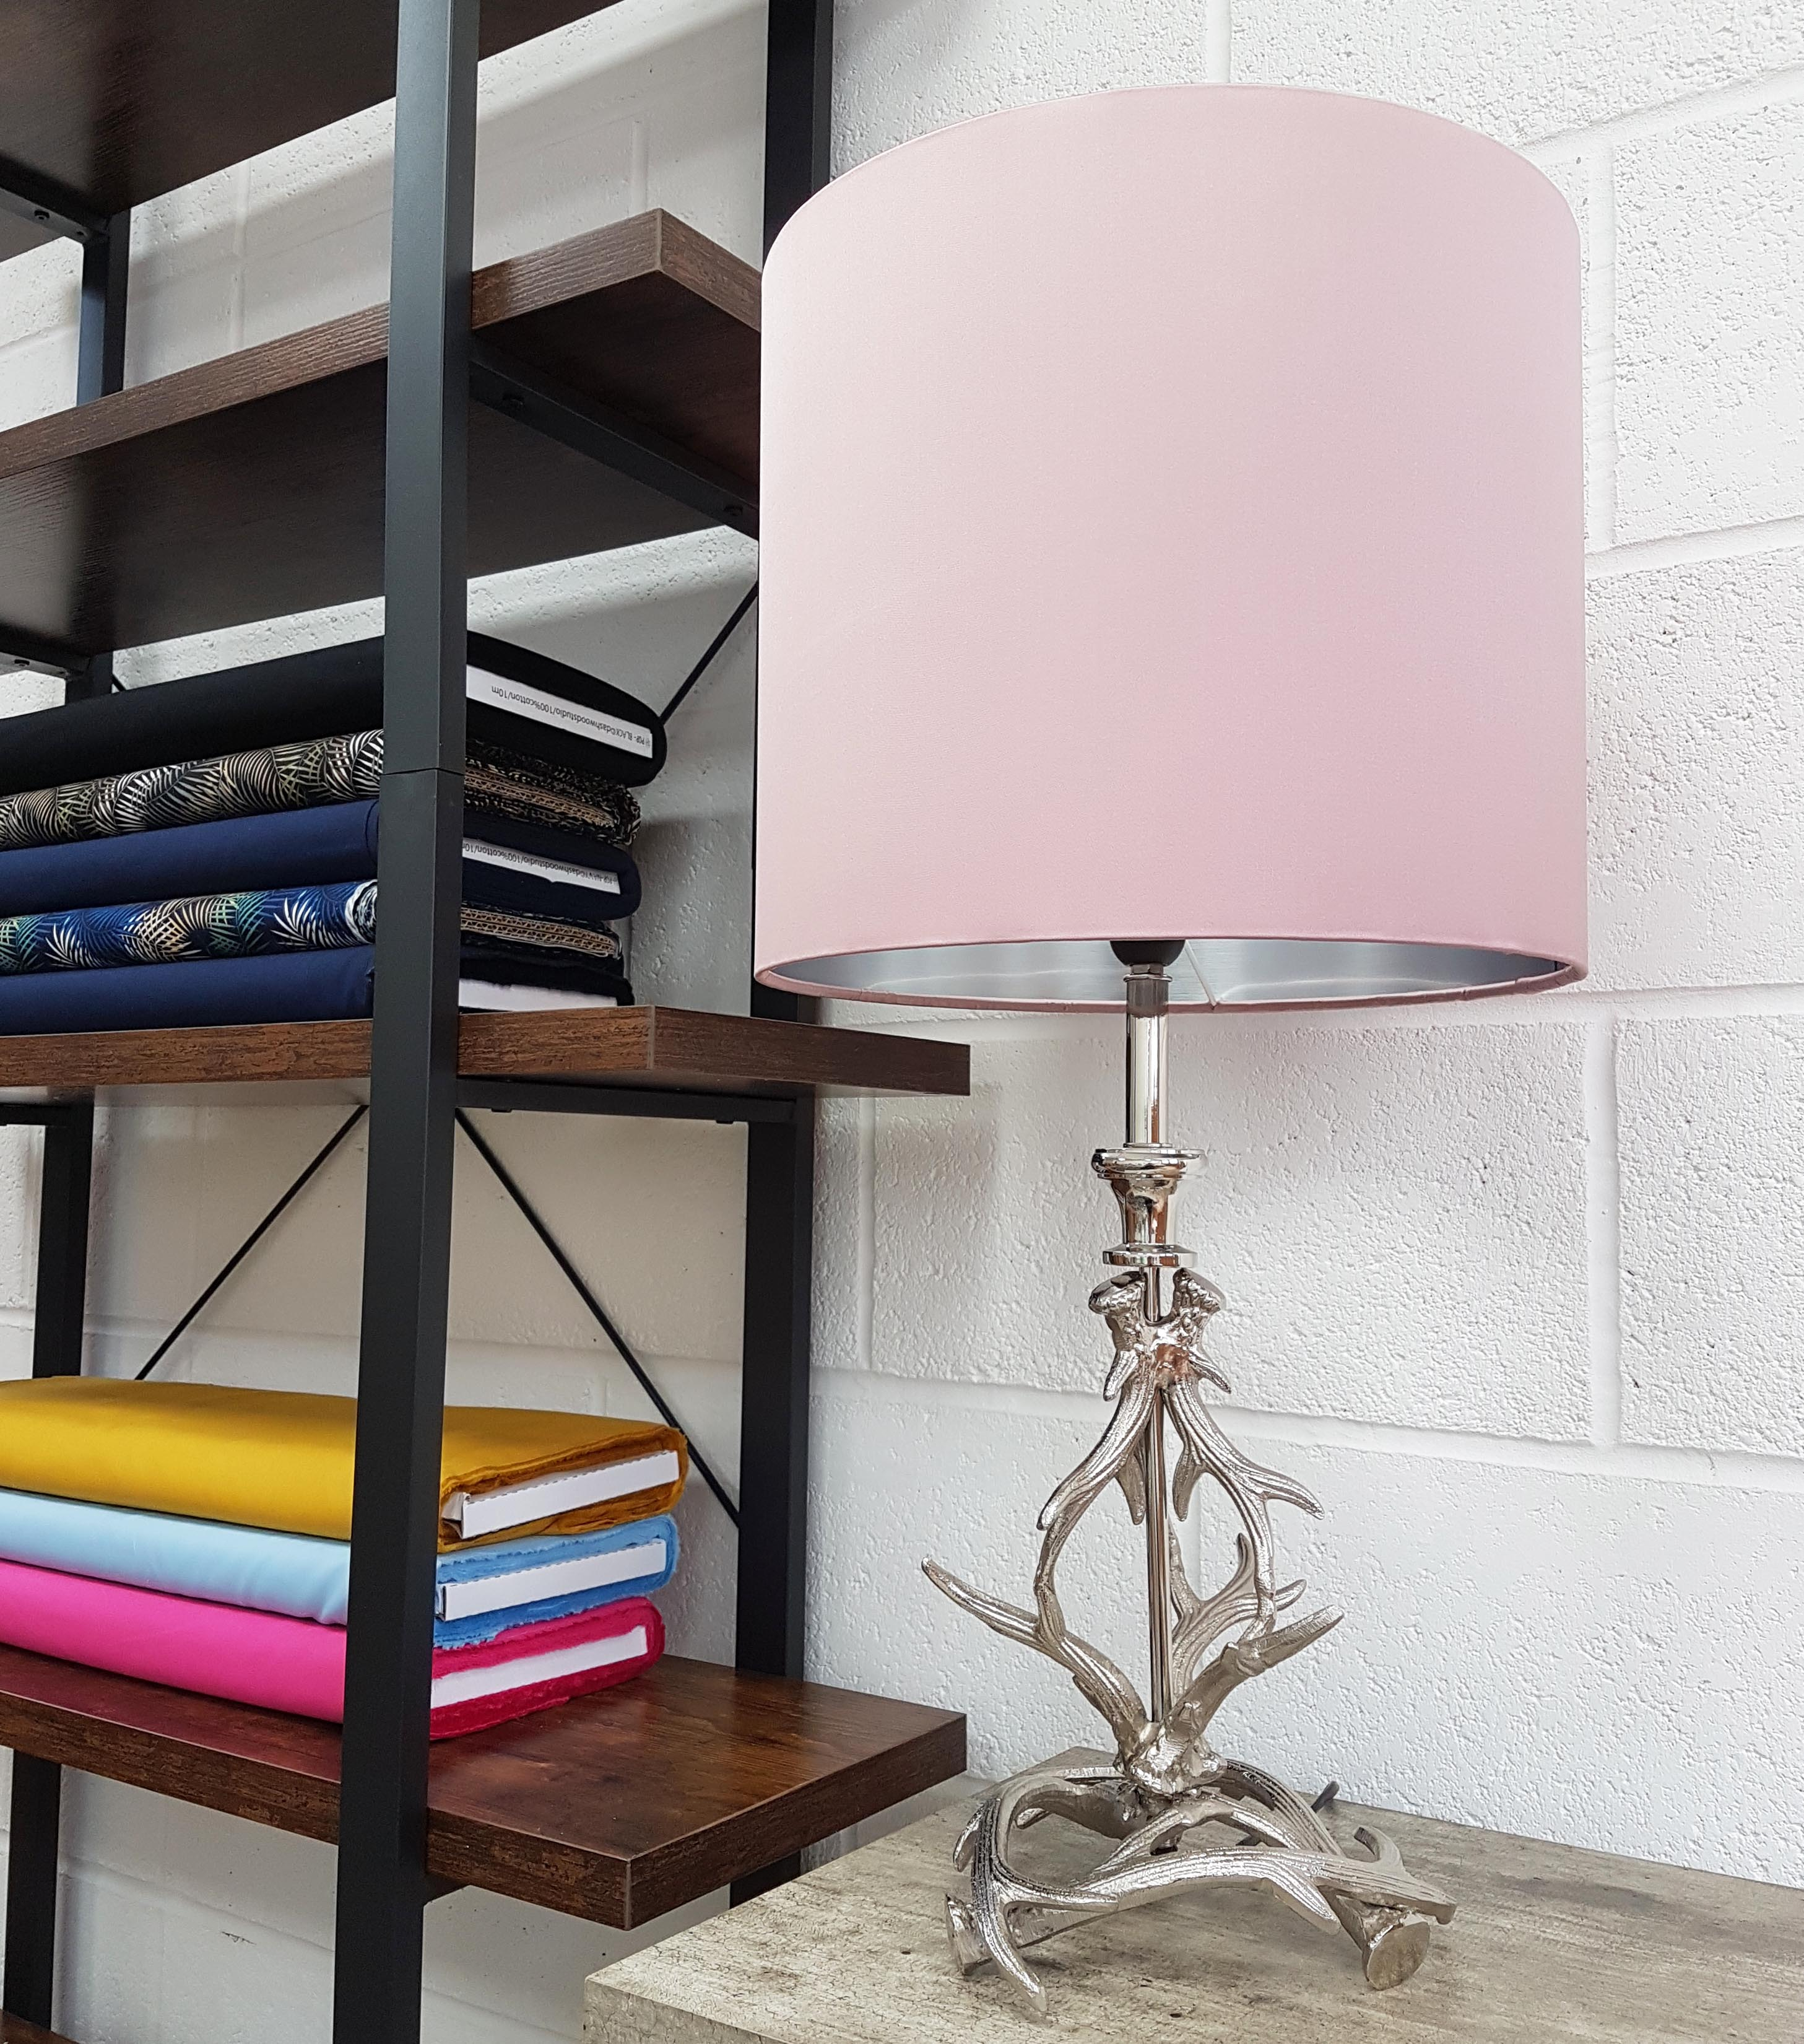 Silver Decorative Table Lamp in Antler Design